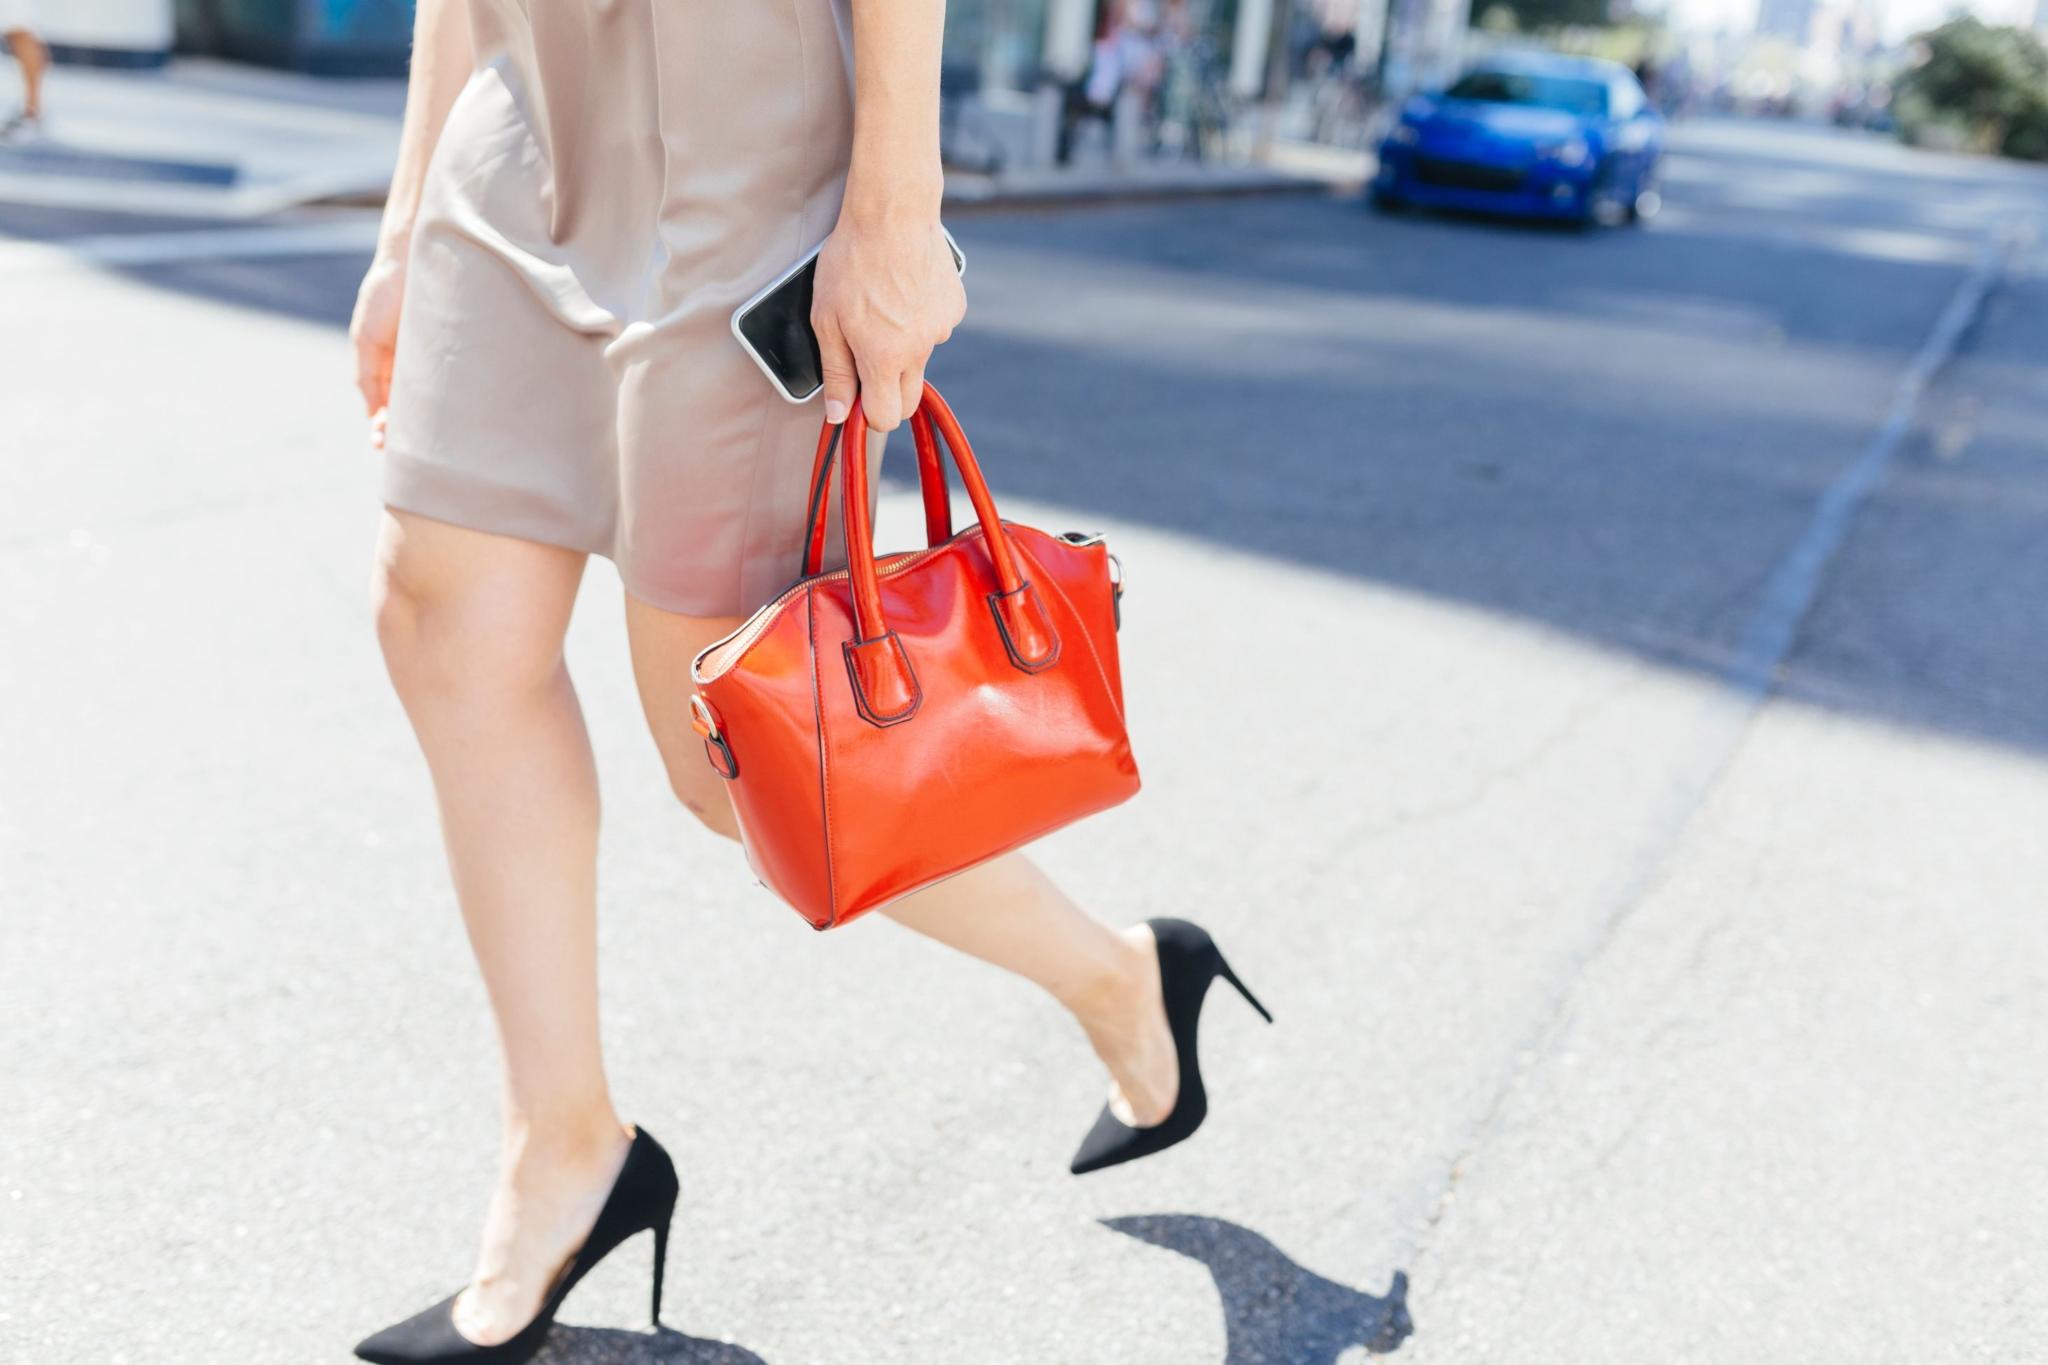 red-purse-scaled.jpeg